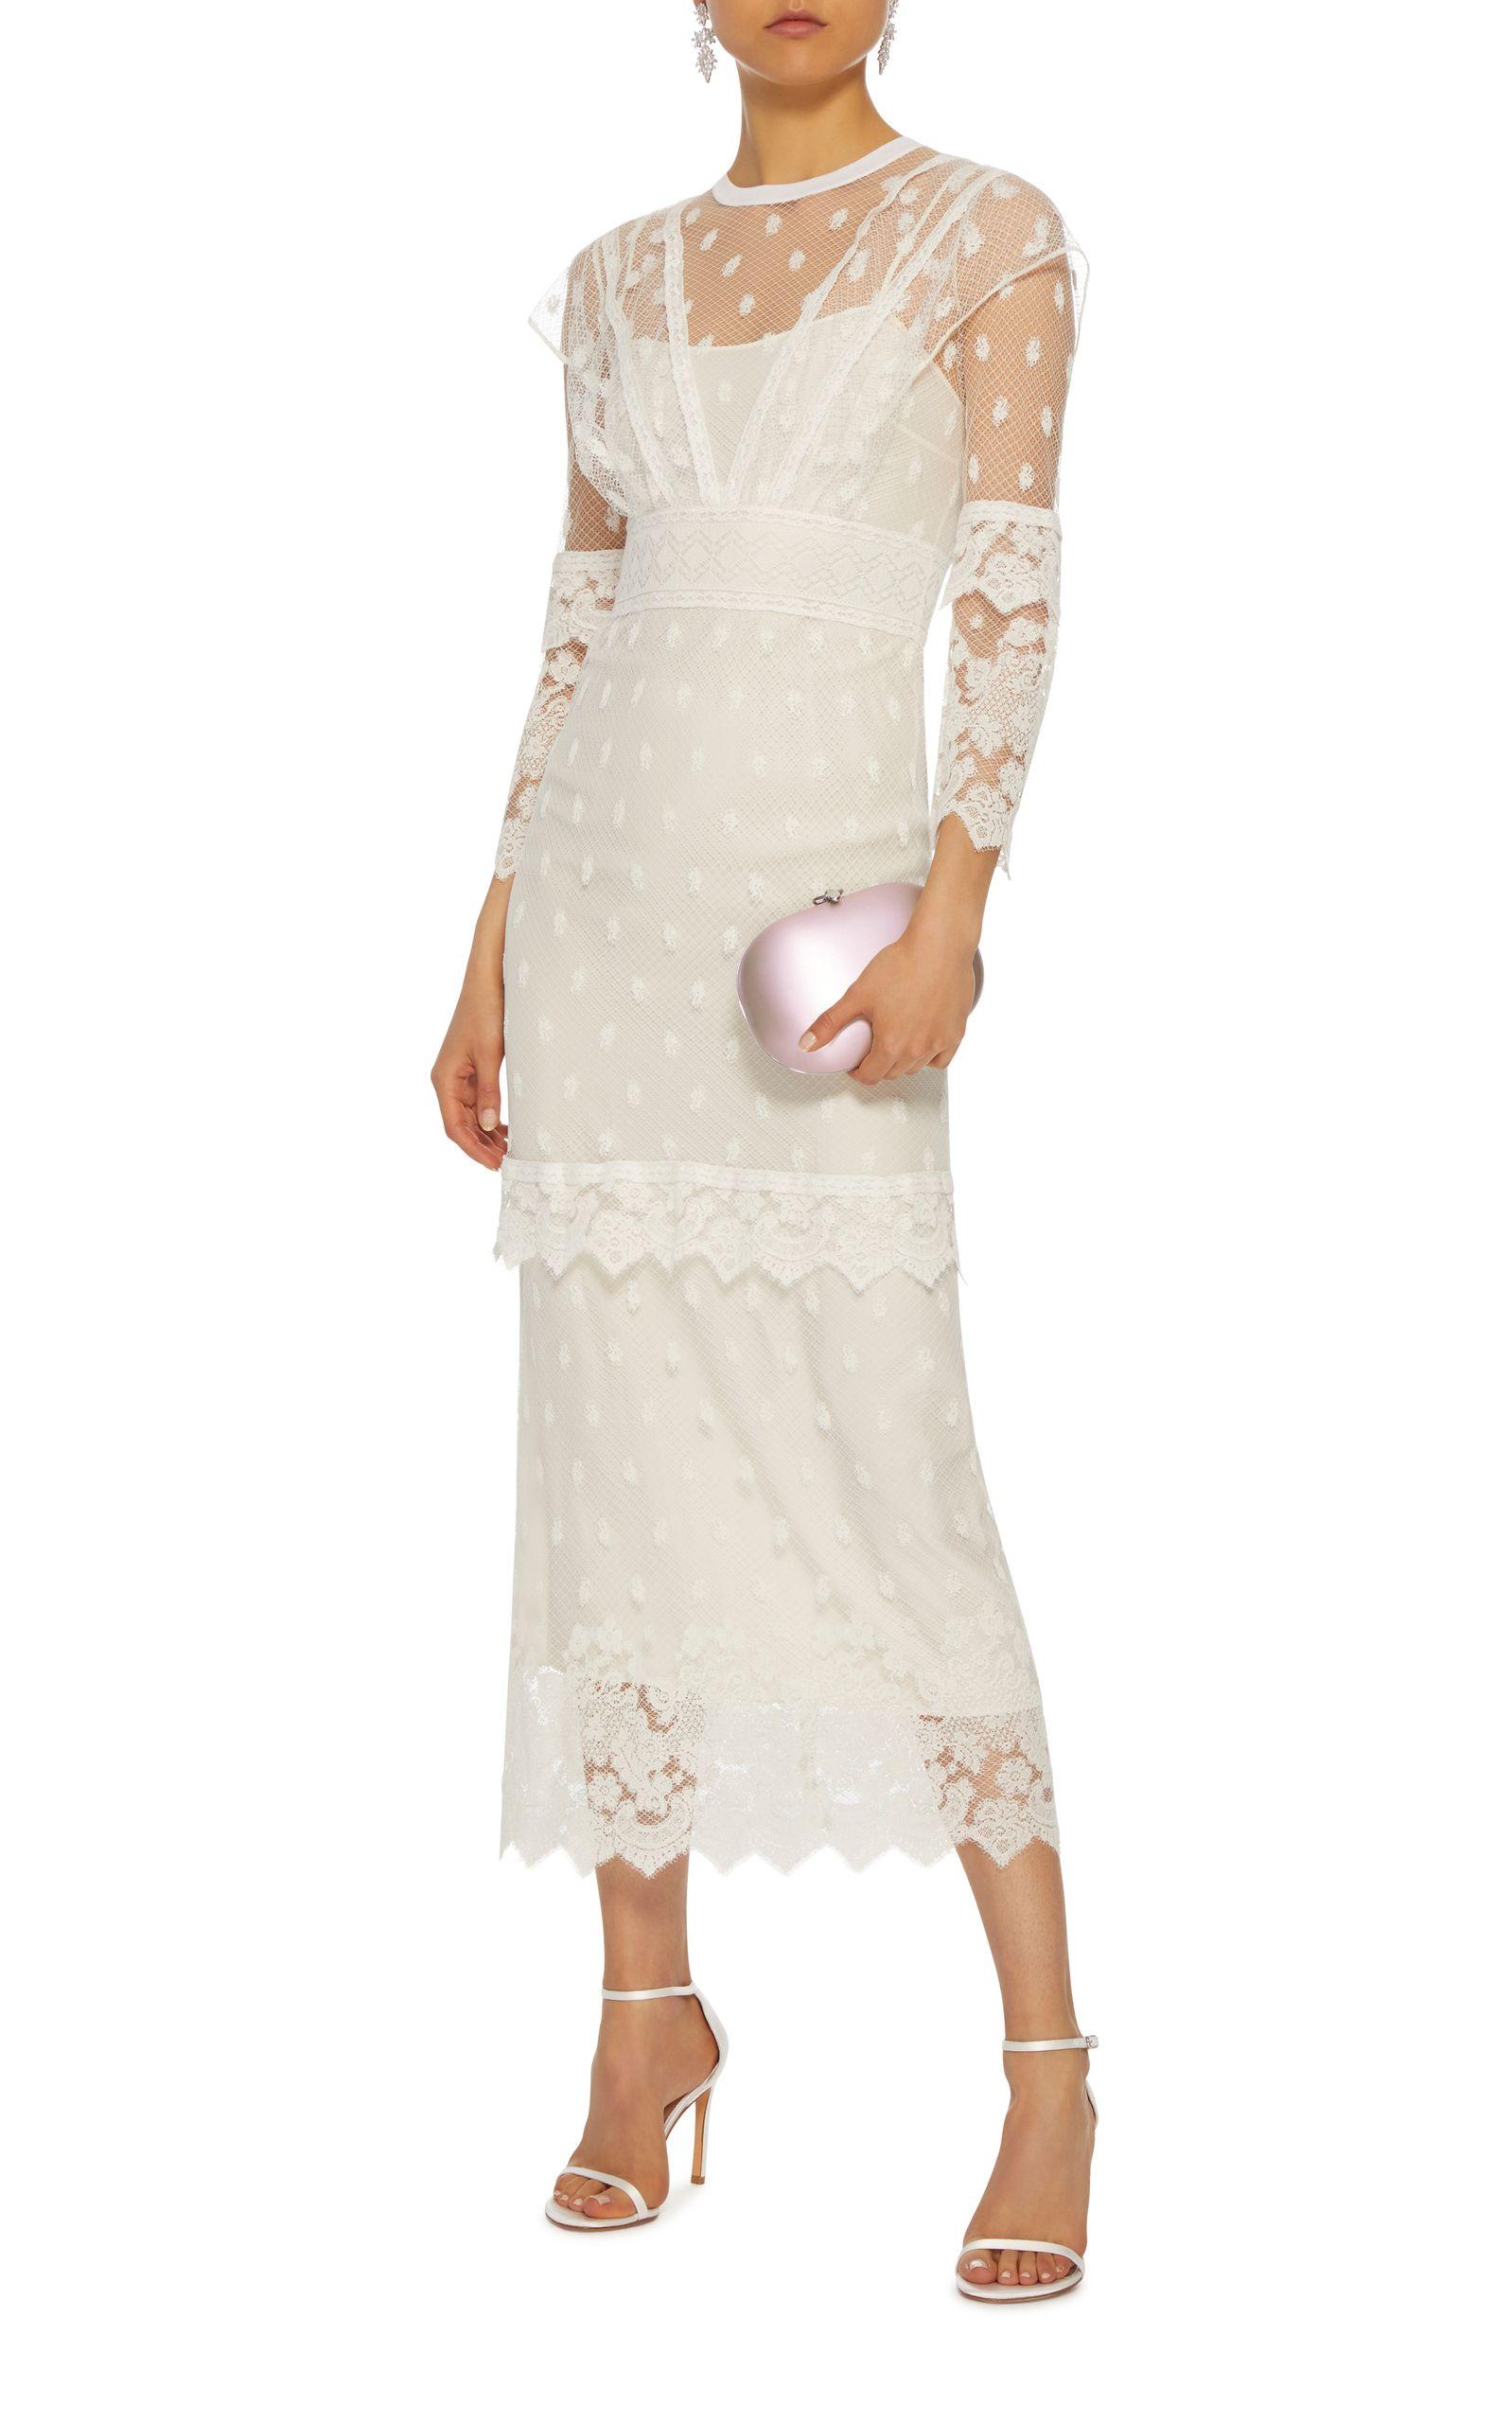 Wedding shoes for lace dress  Stuart Weitzman Nudist Song Satin Heels    Wedding Shoes